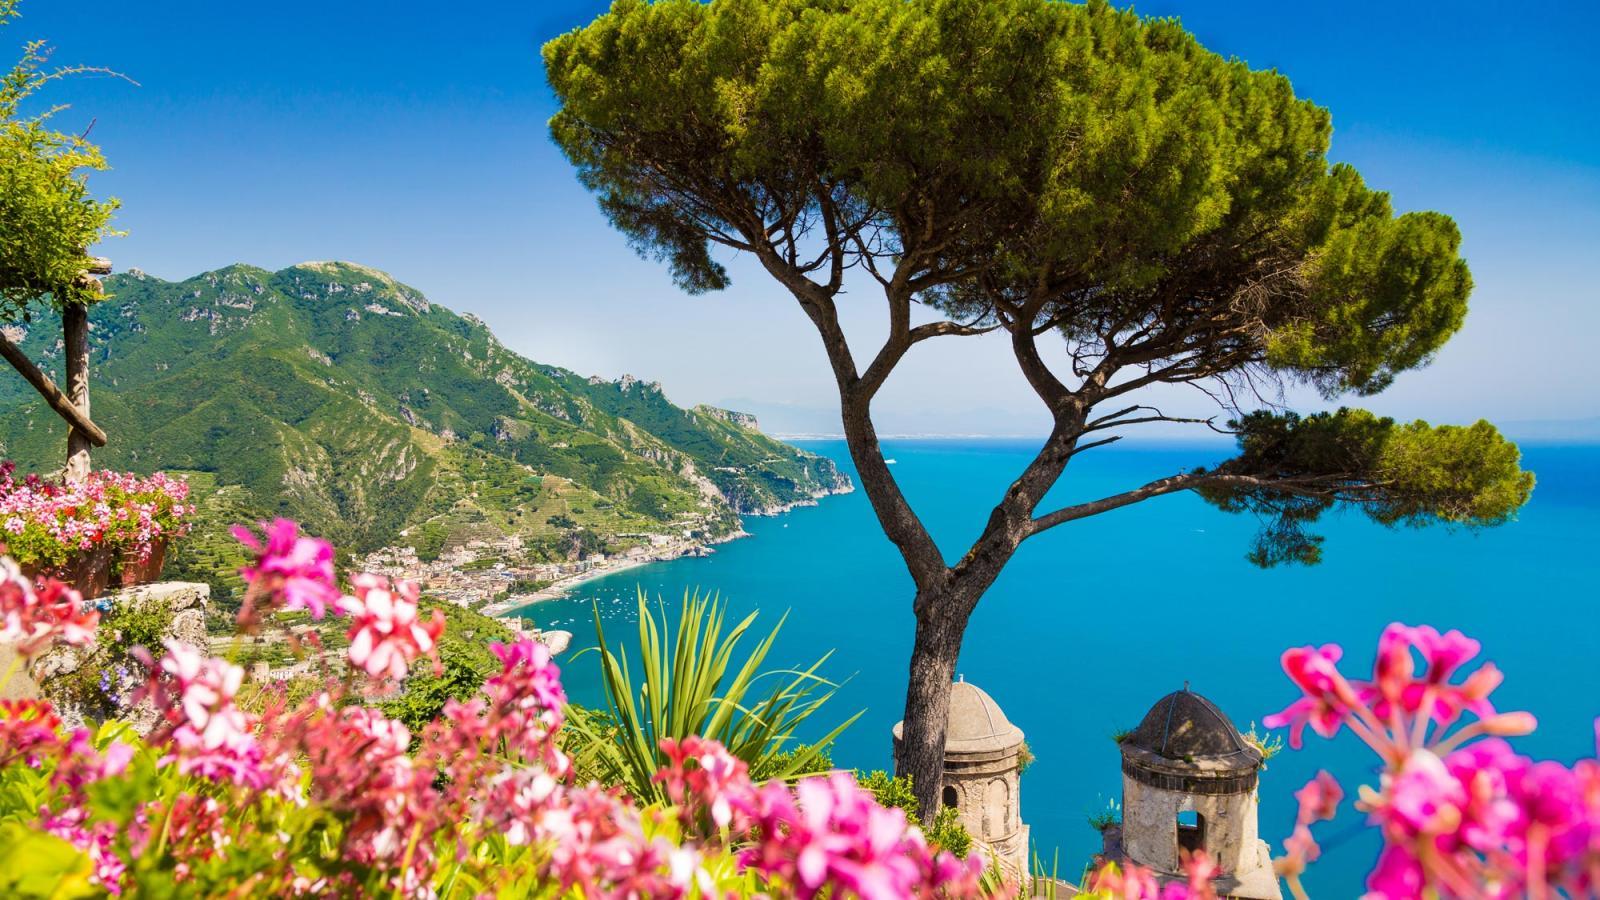 Sorrento The Amalfi Coast Holidays 2017 Topflight